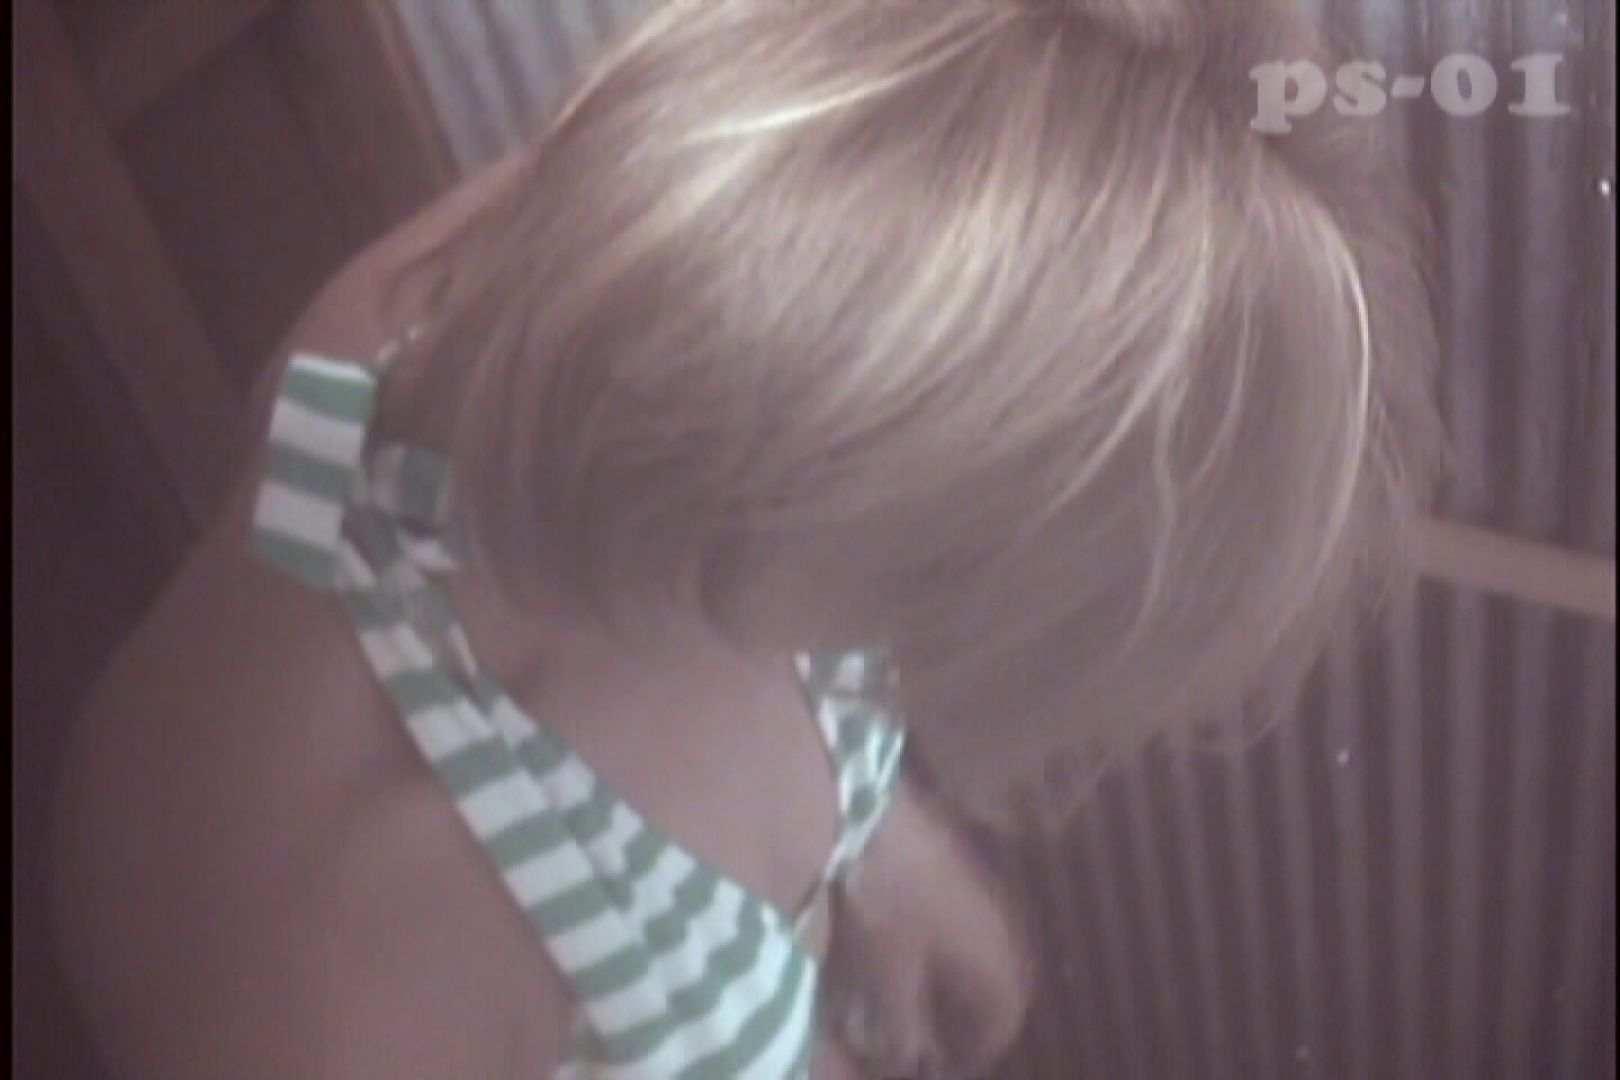 File.03 ぱっと見若いけど、お腹のたるみが出産経験を物語る。 盗撮エロすぎ | シャワー中  88連発 80